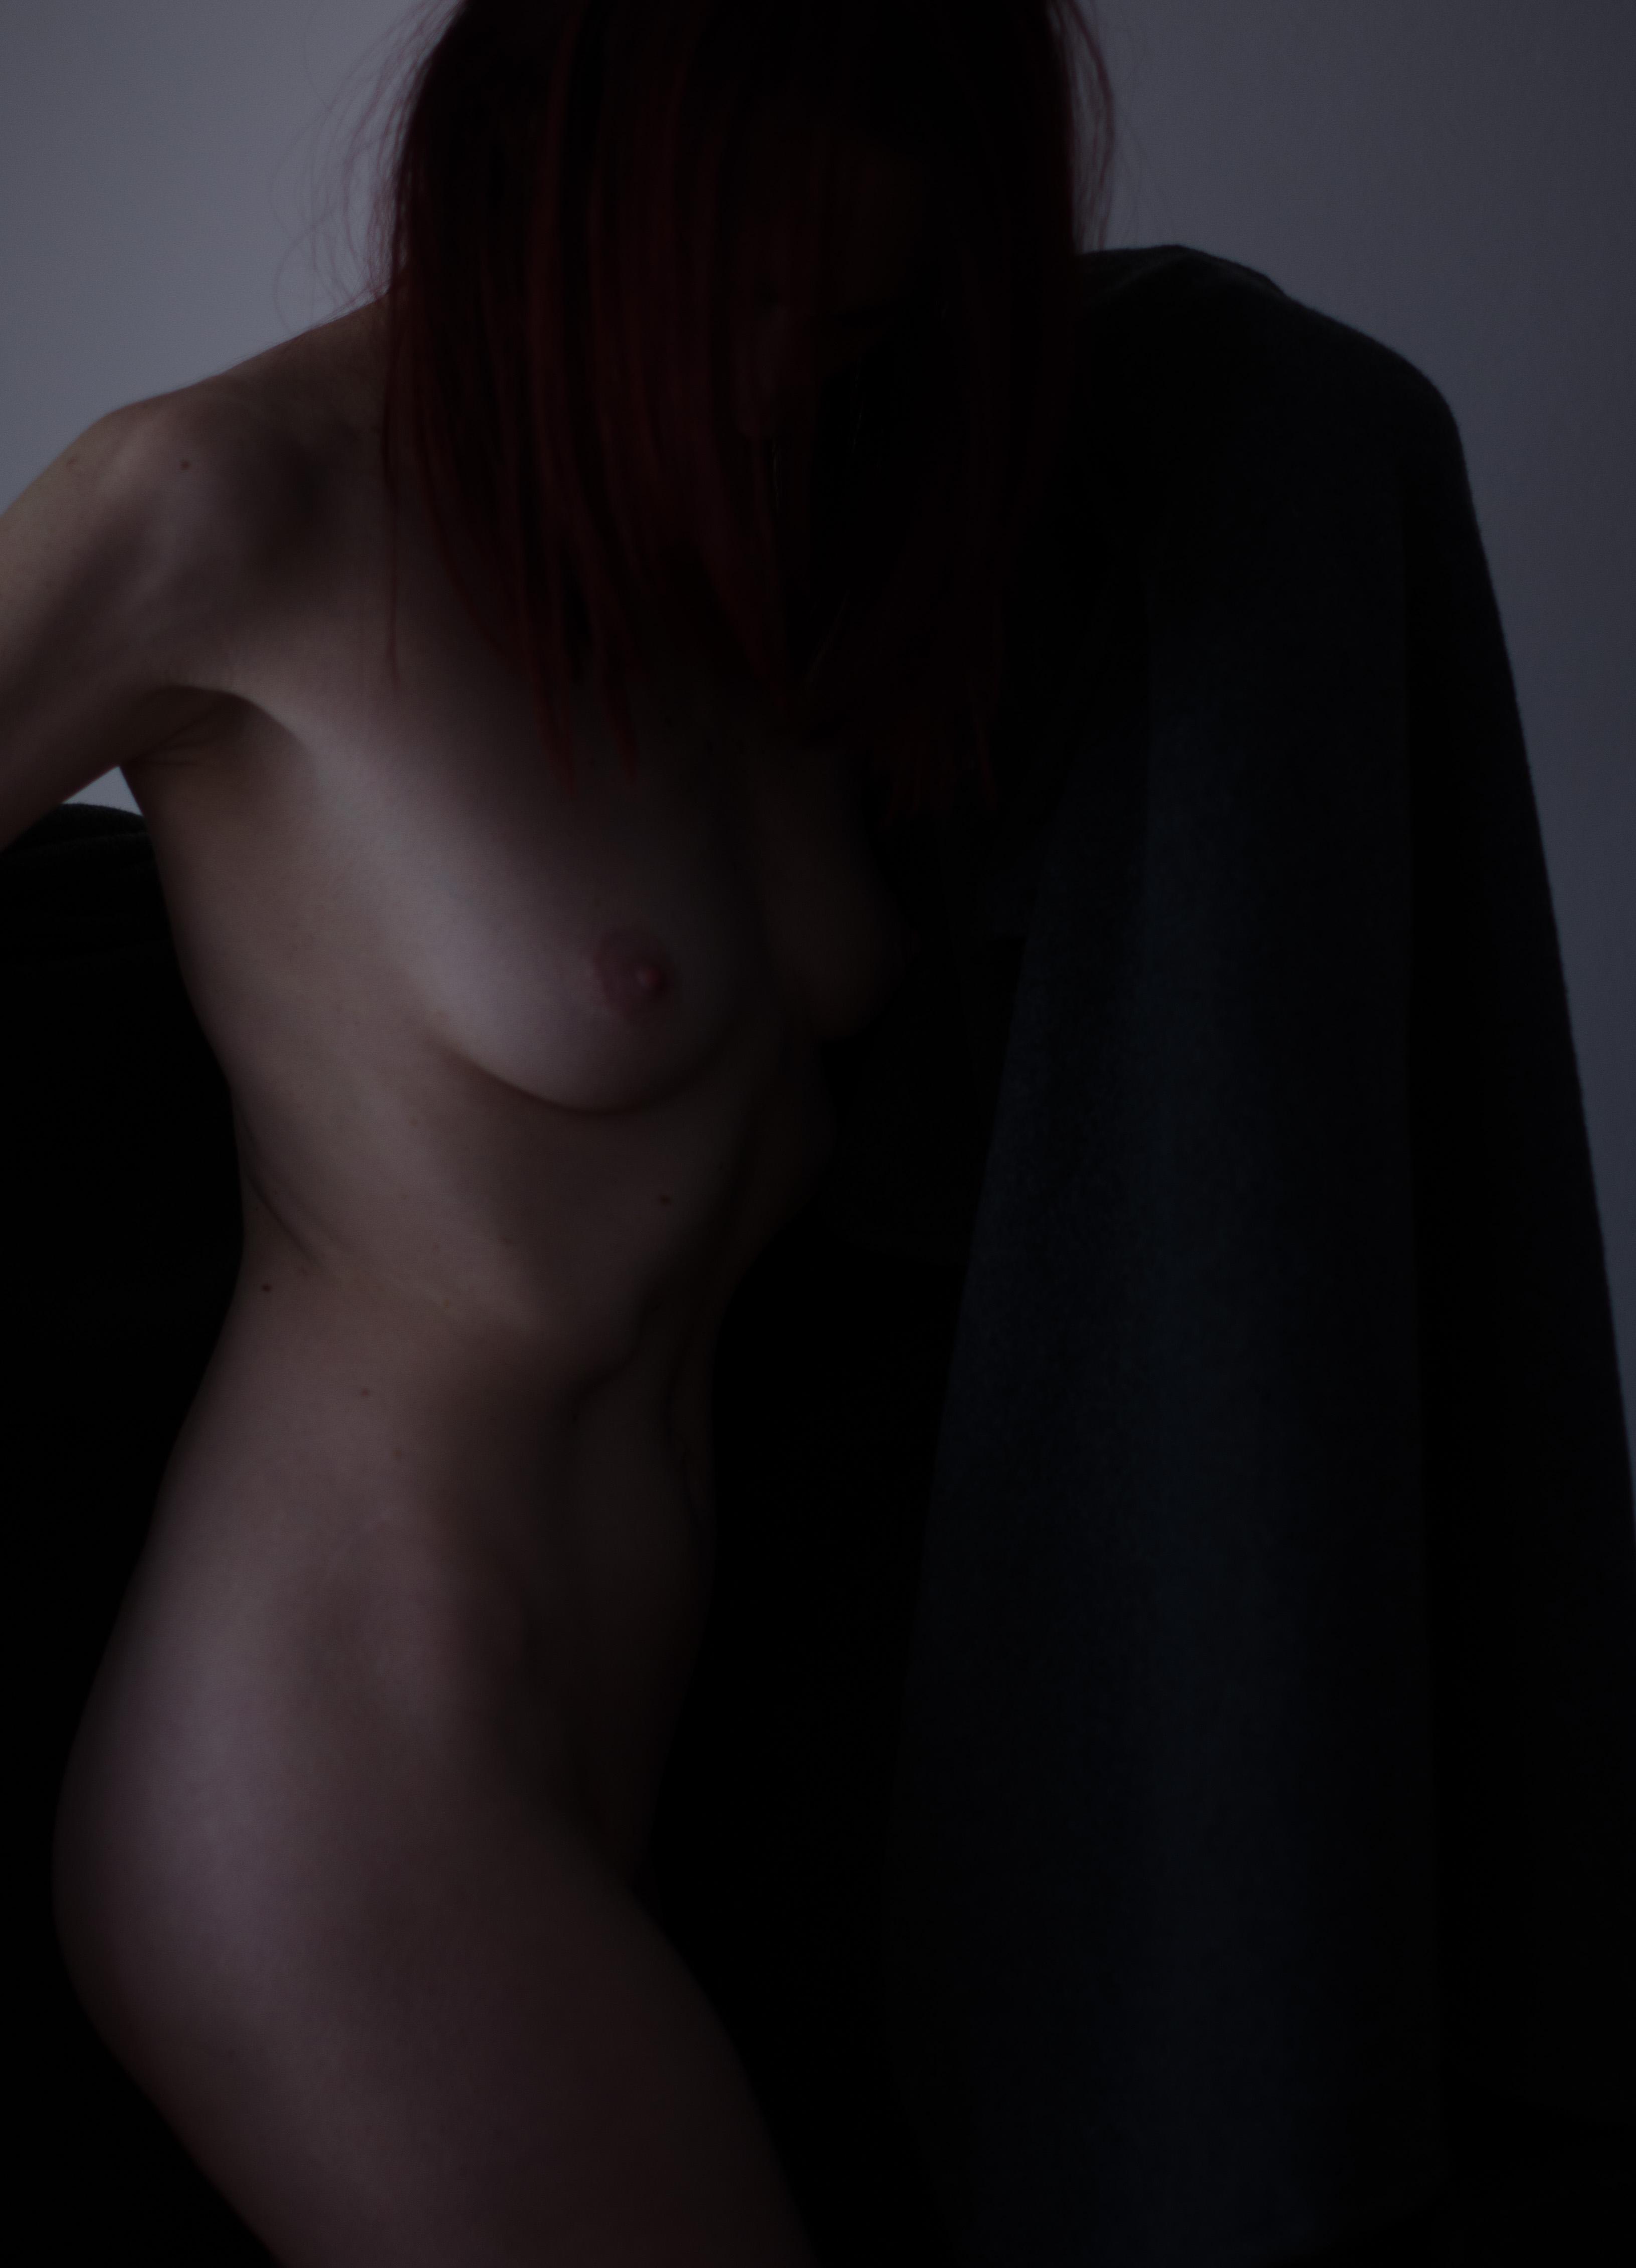 185_Serenity_1